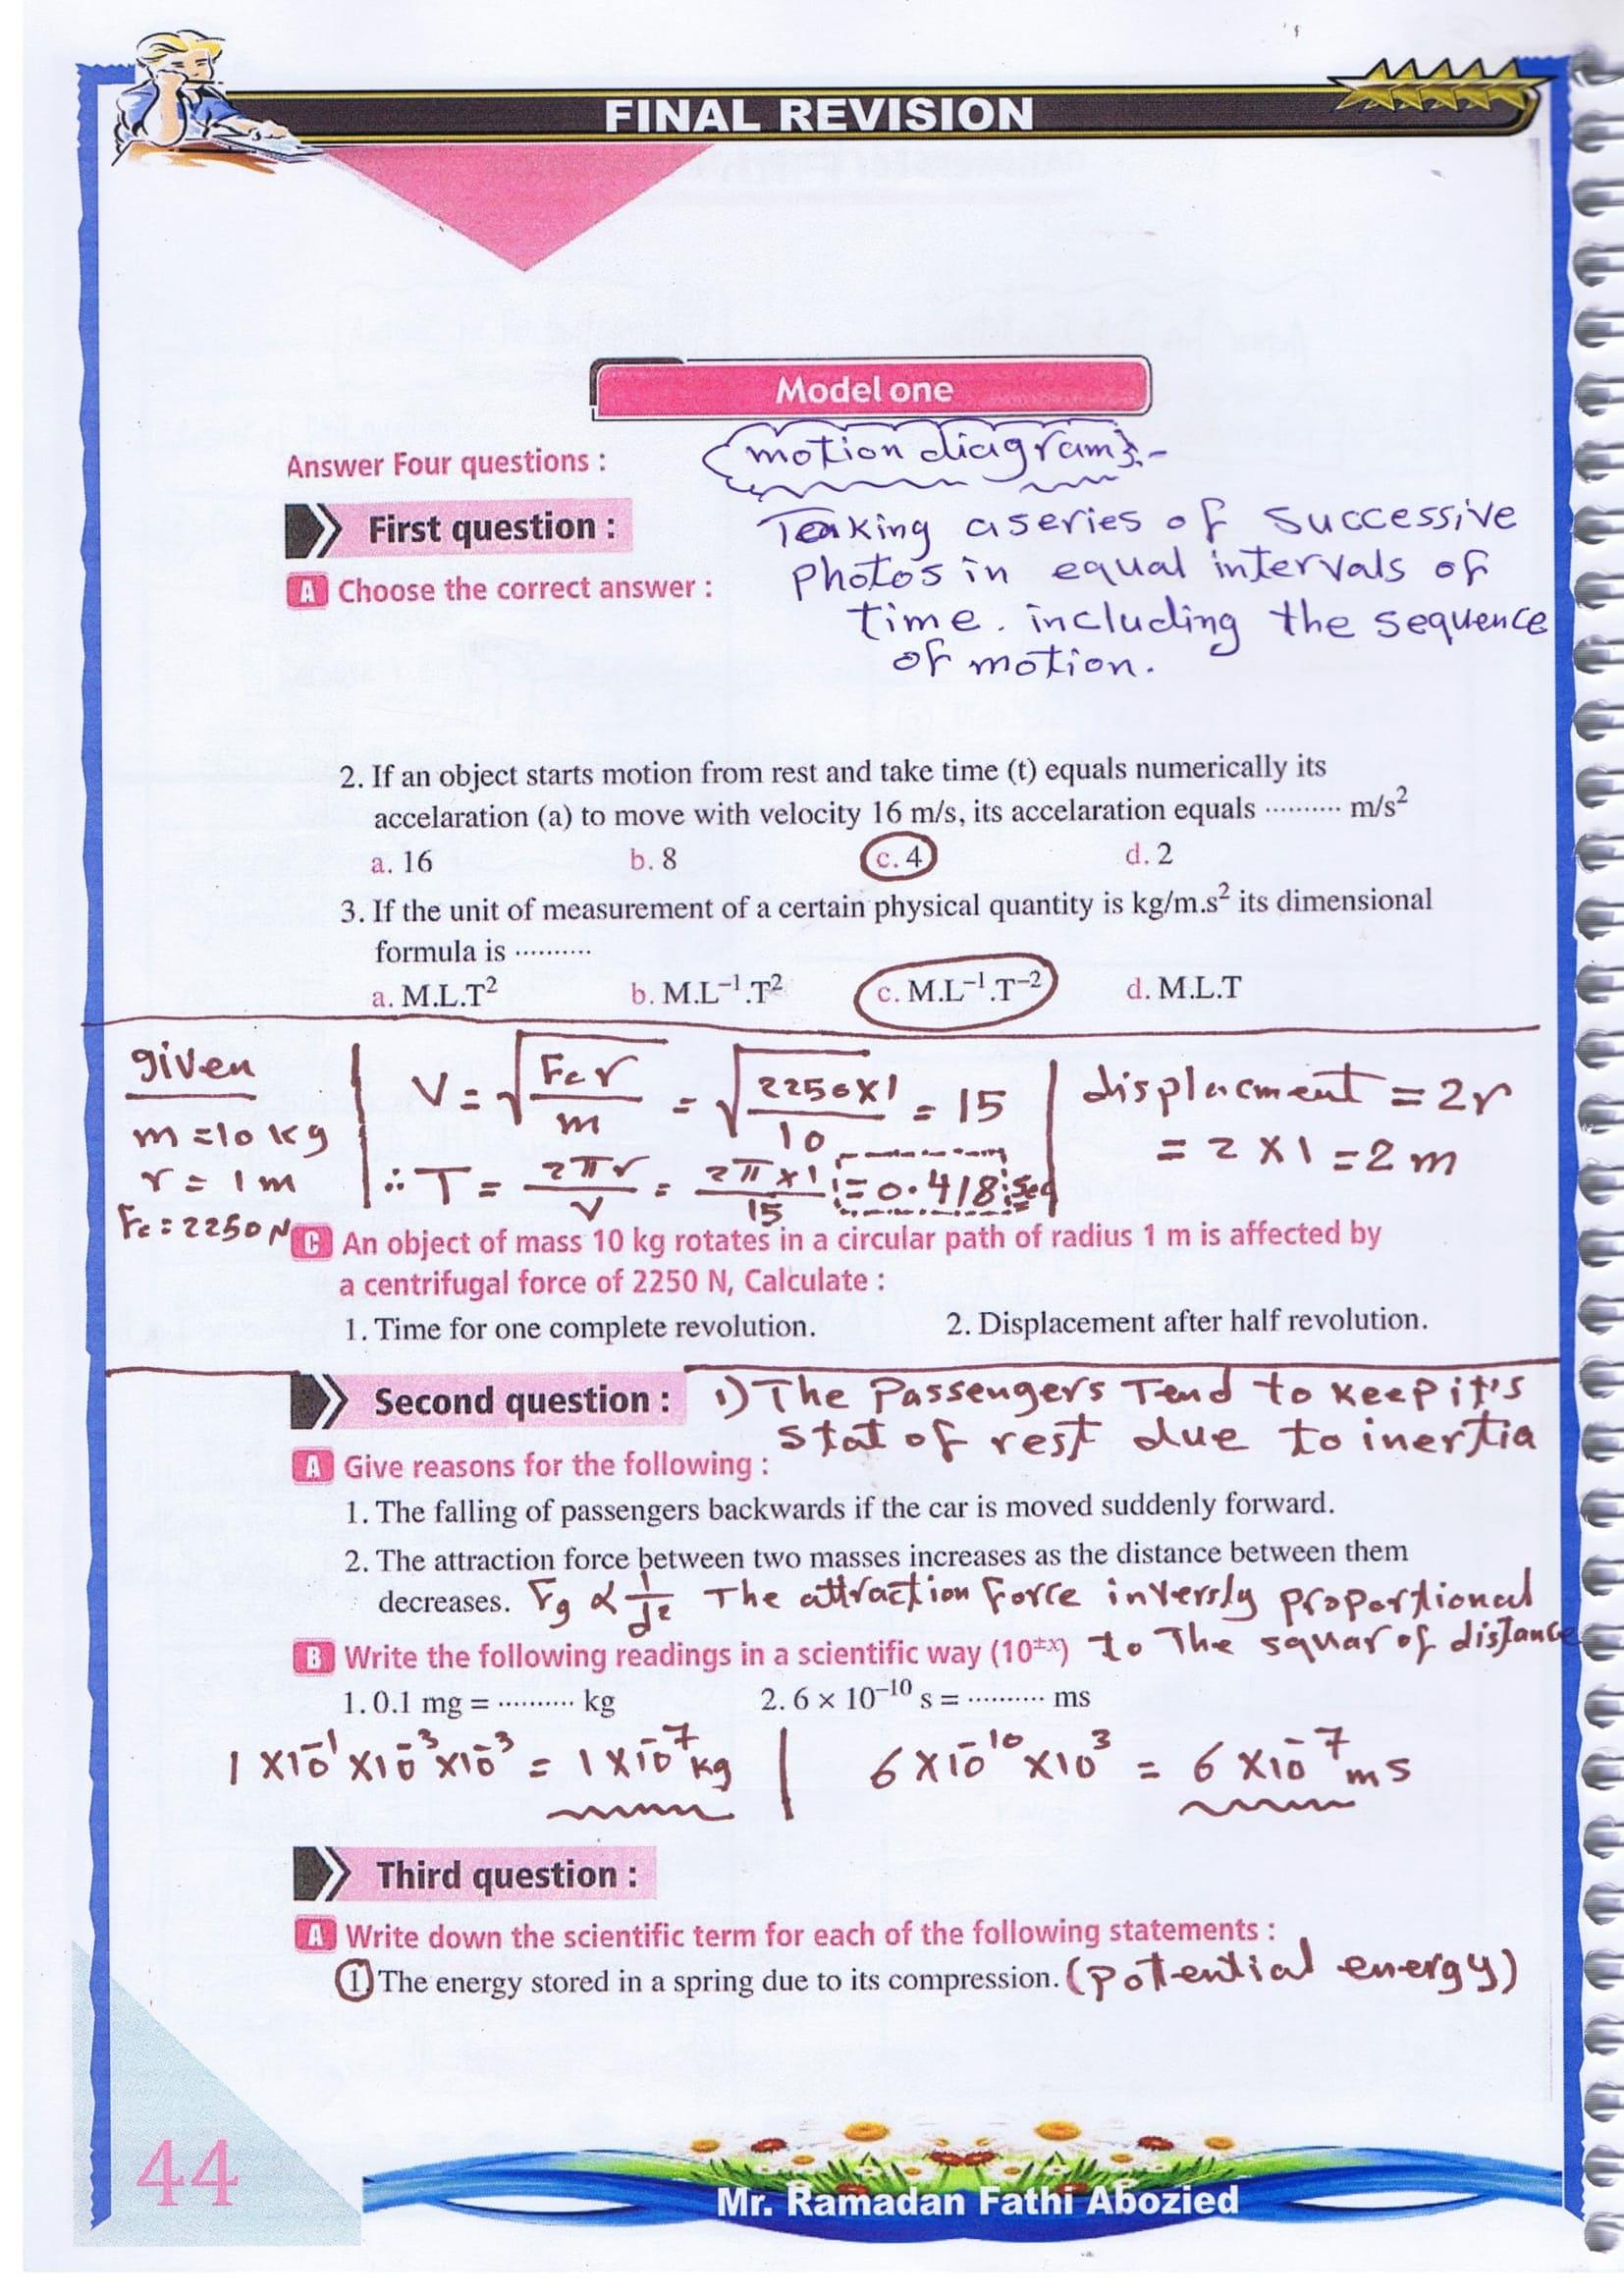 exam-eg.com_1511529901391.jpg